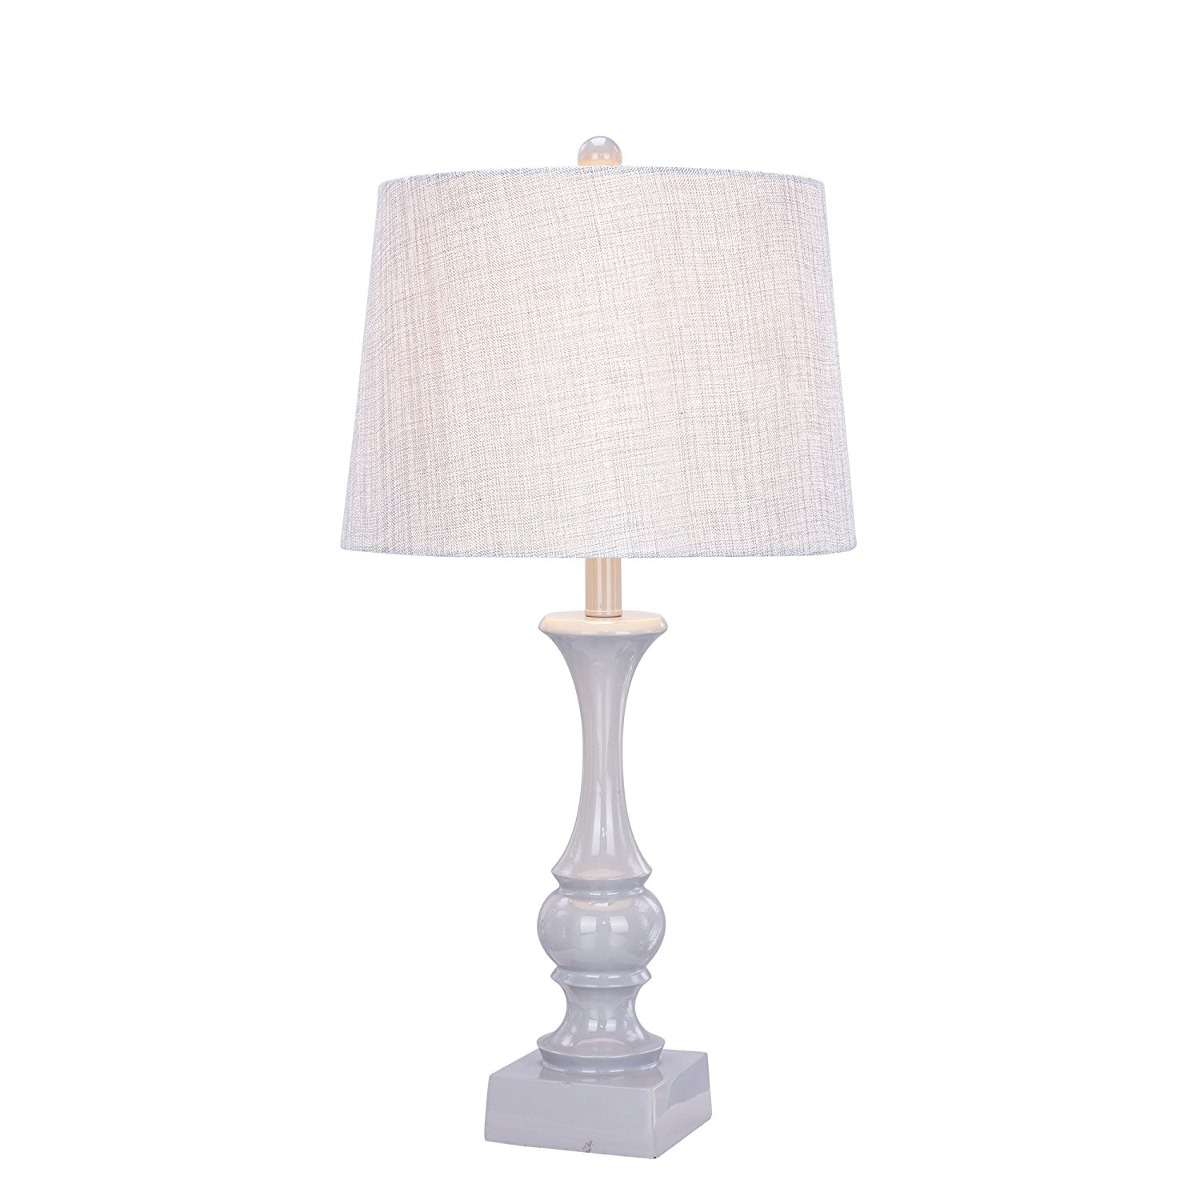 Cory martin w 6216cg resin table lamp in cool grey finish28 resin table lamp in cool grey finish28 cargando zoom aloadofball Gallery